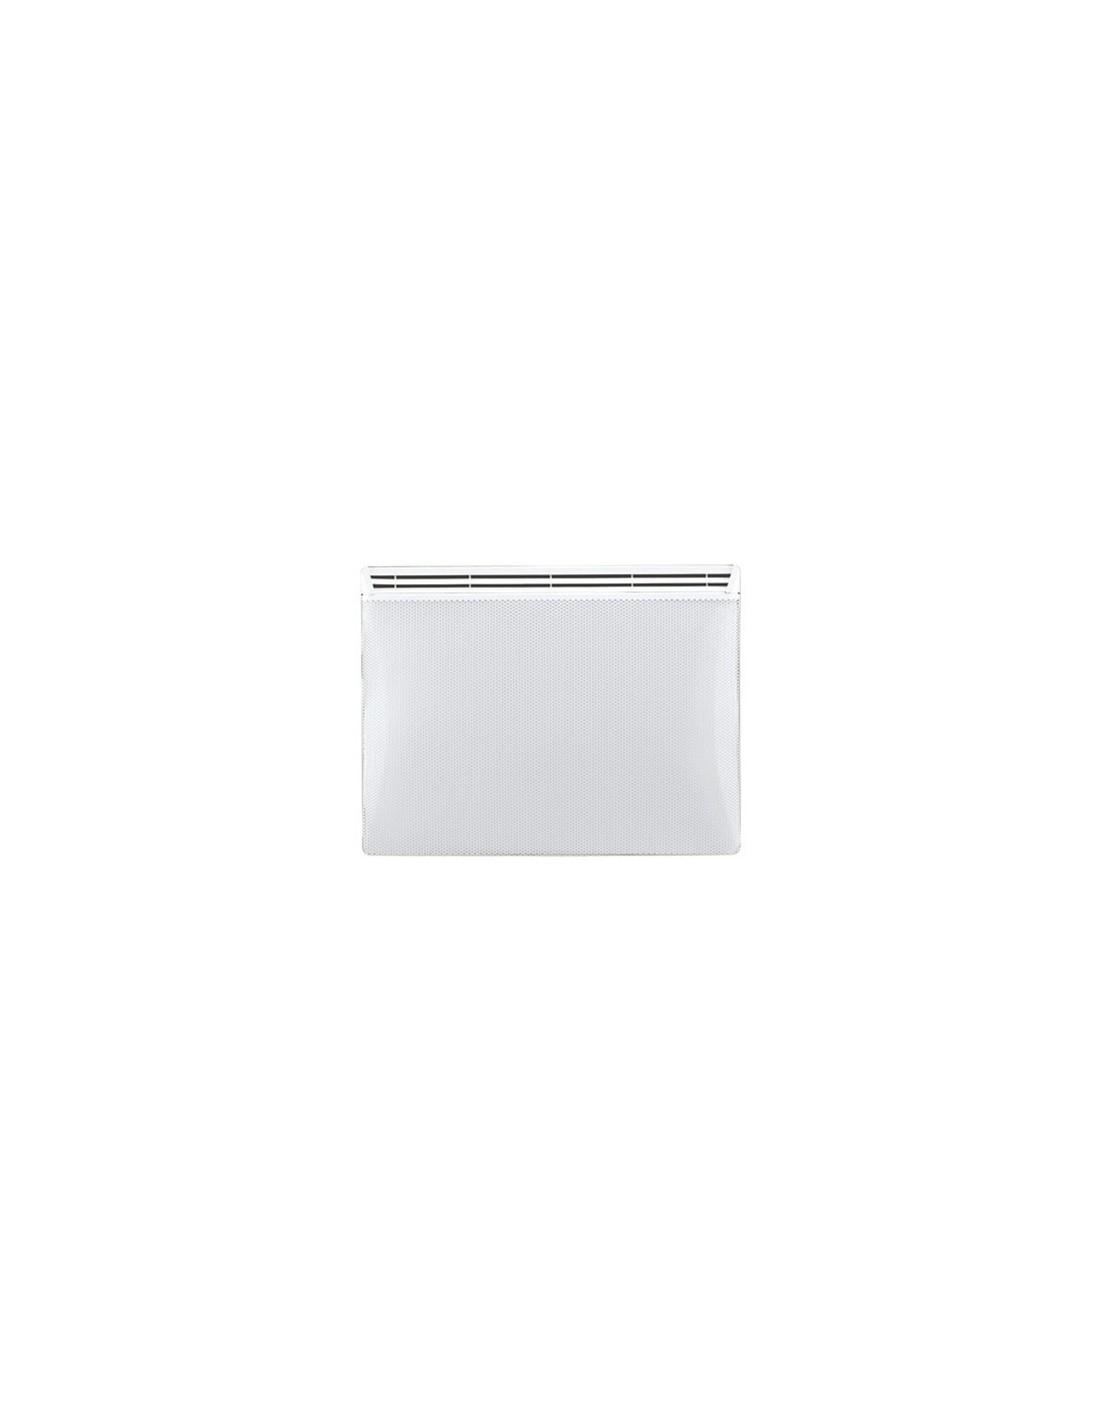 chauffage lectrique panneau rayonnant soluis horizontal 2000w atlantic. Black Bedroom Furniture Sets. Home Design Ideas